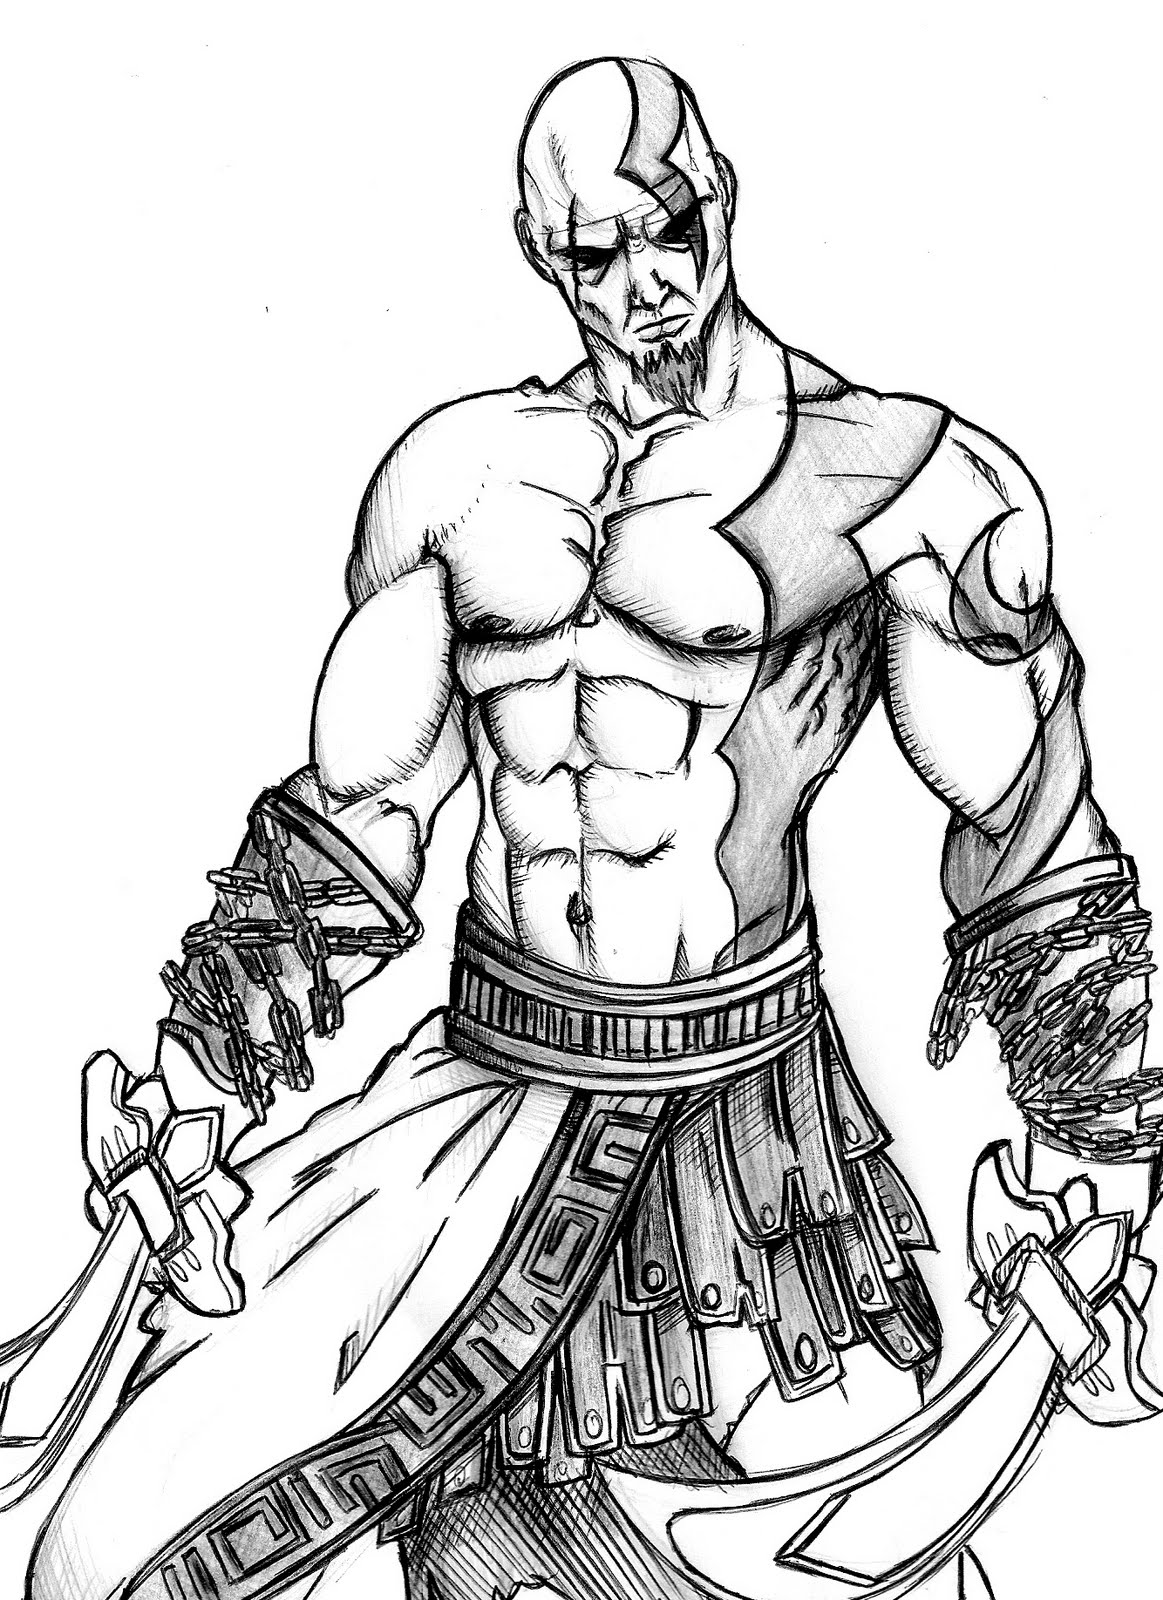 1163x1600 Prancheta Pencil Art God Of War